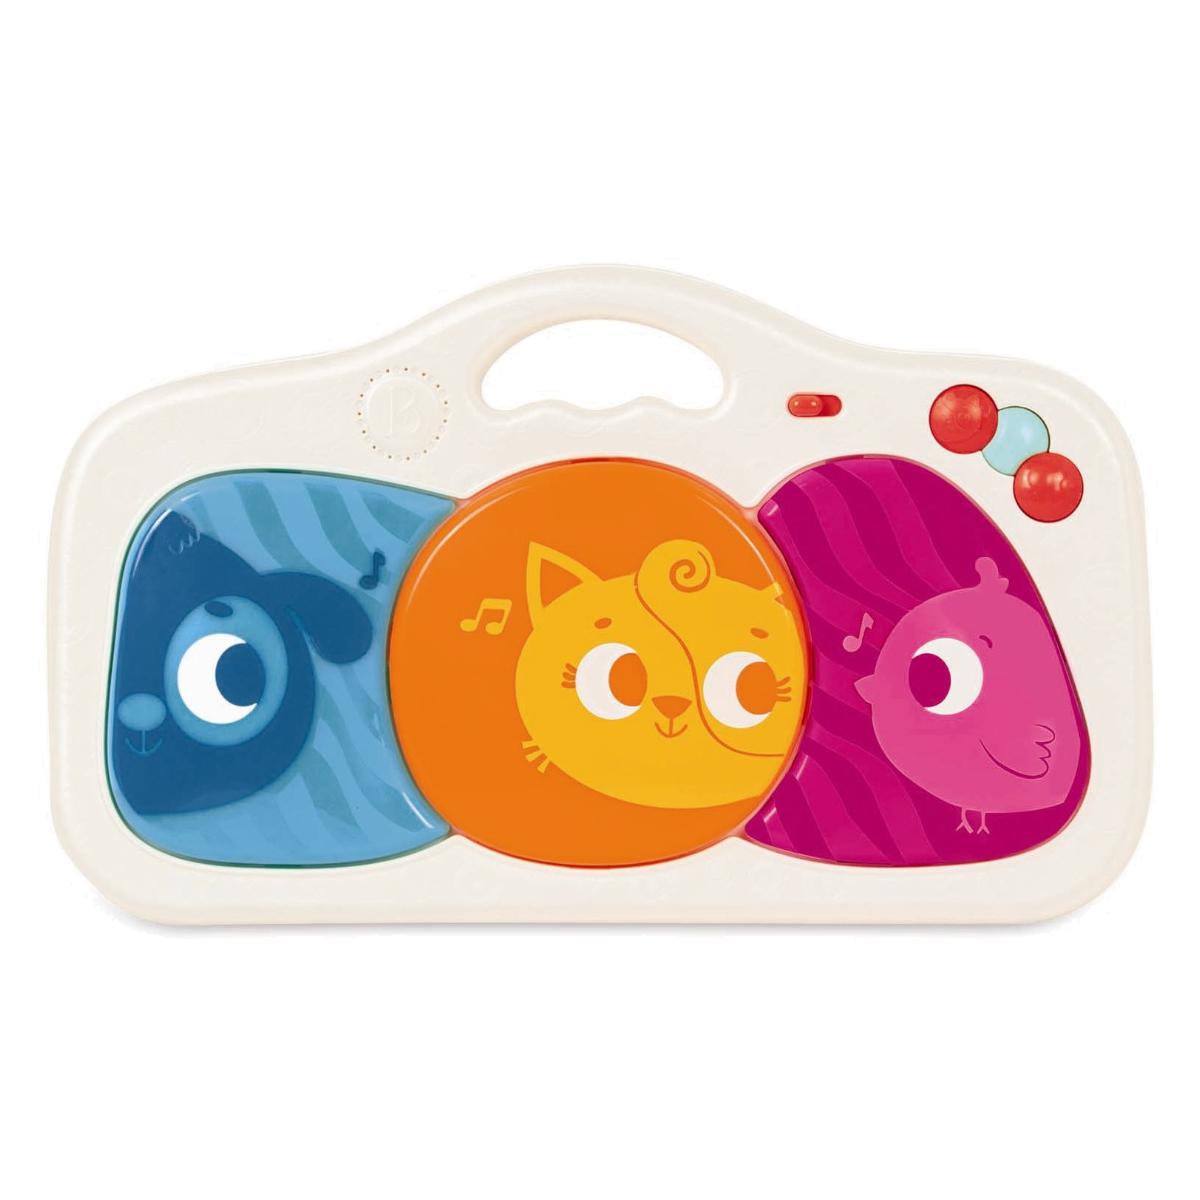 Image of B Toys Kick and Play musikpanel